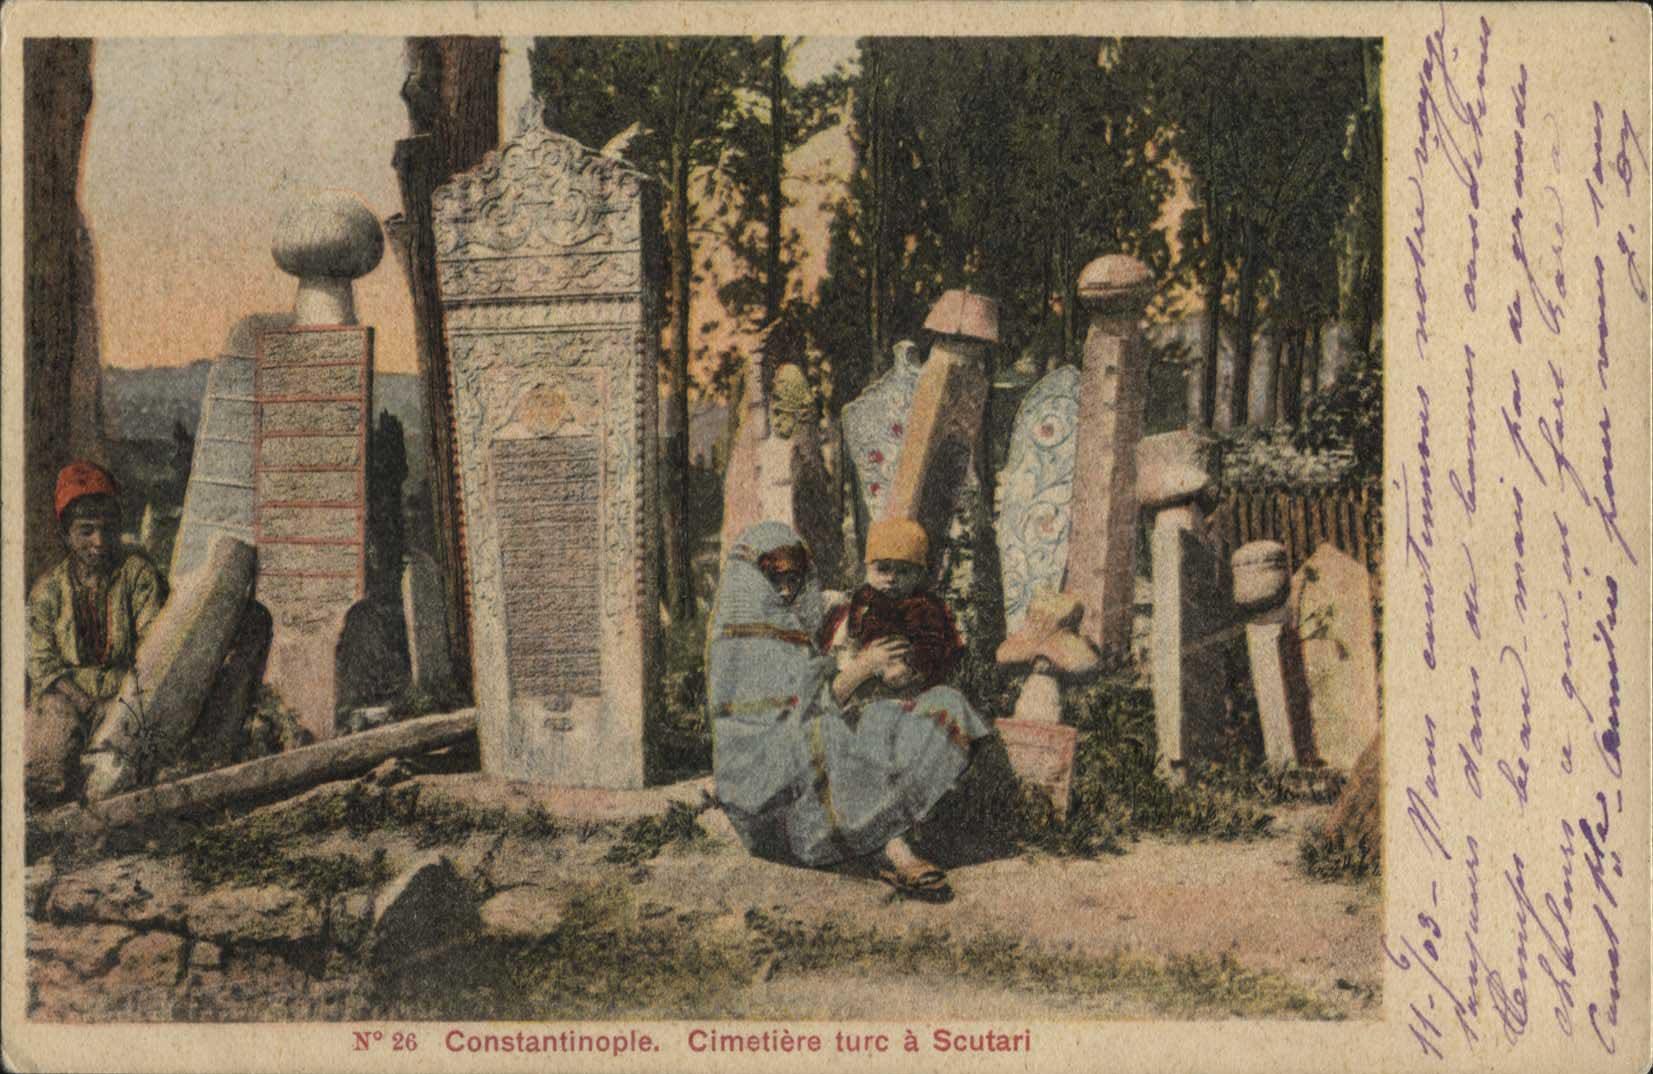 Lot 1761 - -  PICTURE POSTCARDS SMYRNE, CONSTANTINOPLE, ASIA MINOR -  A. Karamitsos Public & Live Internet Auction 675